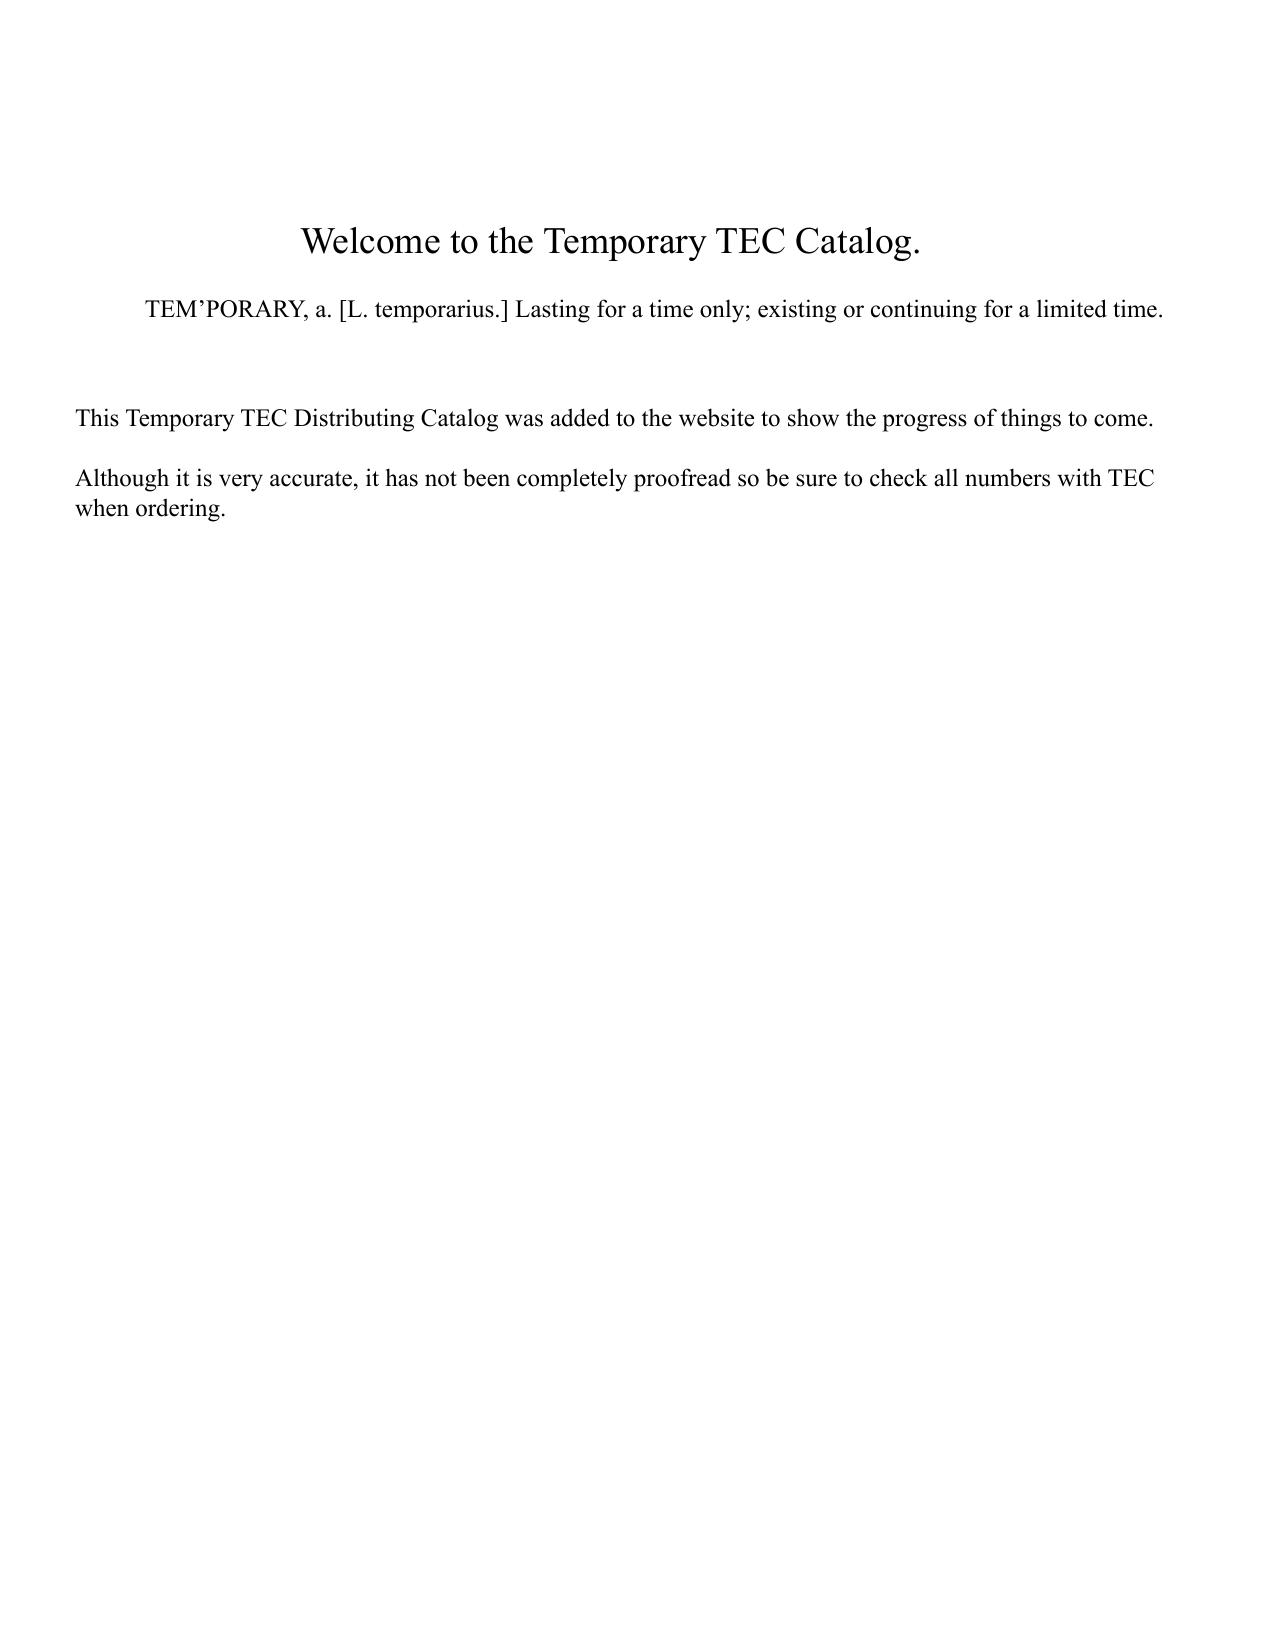 TEC TEMPORARY CATALOG.indd | manualzz.com on